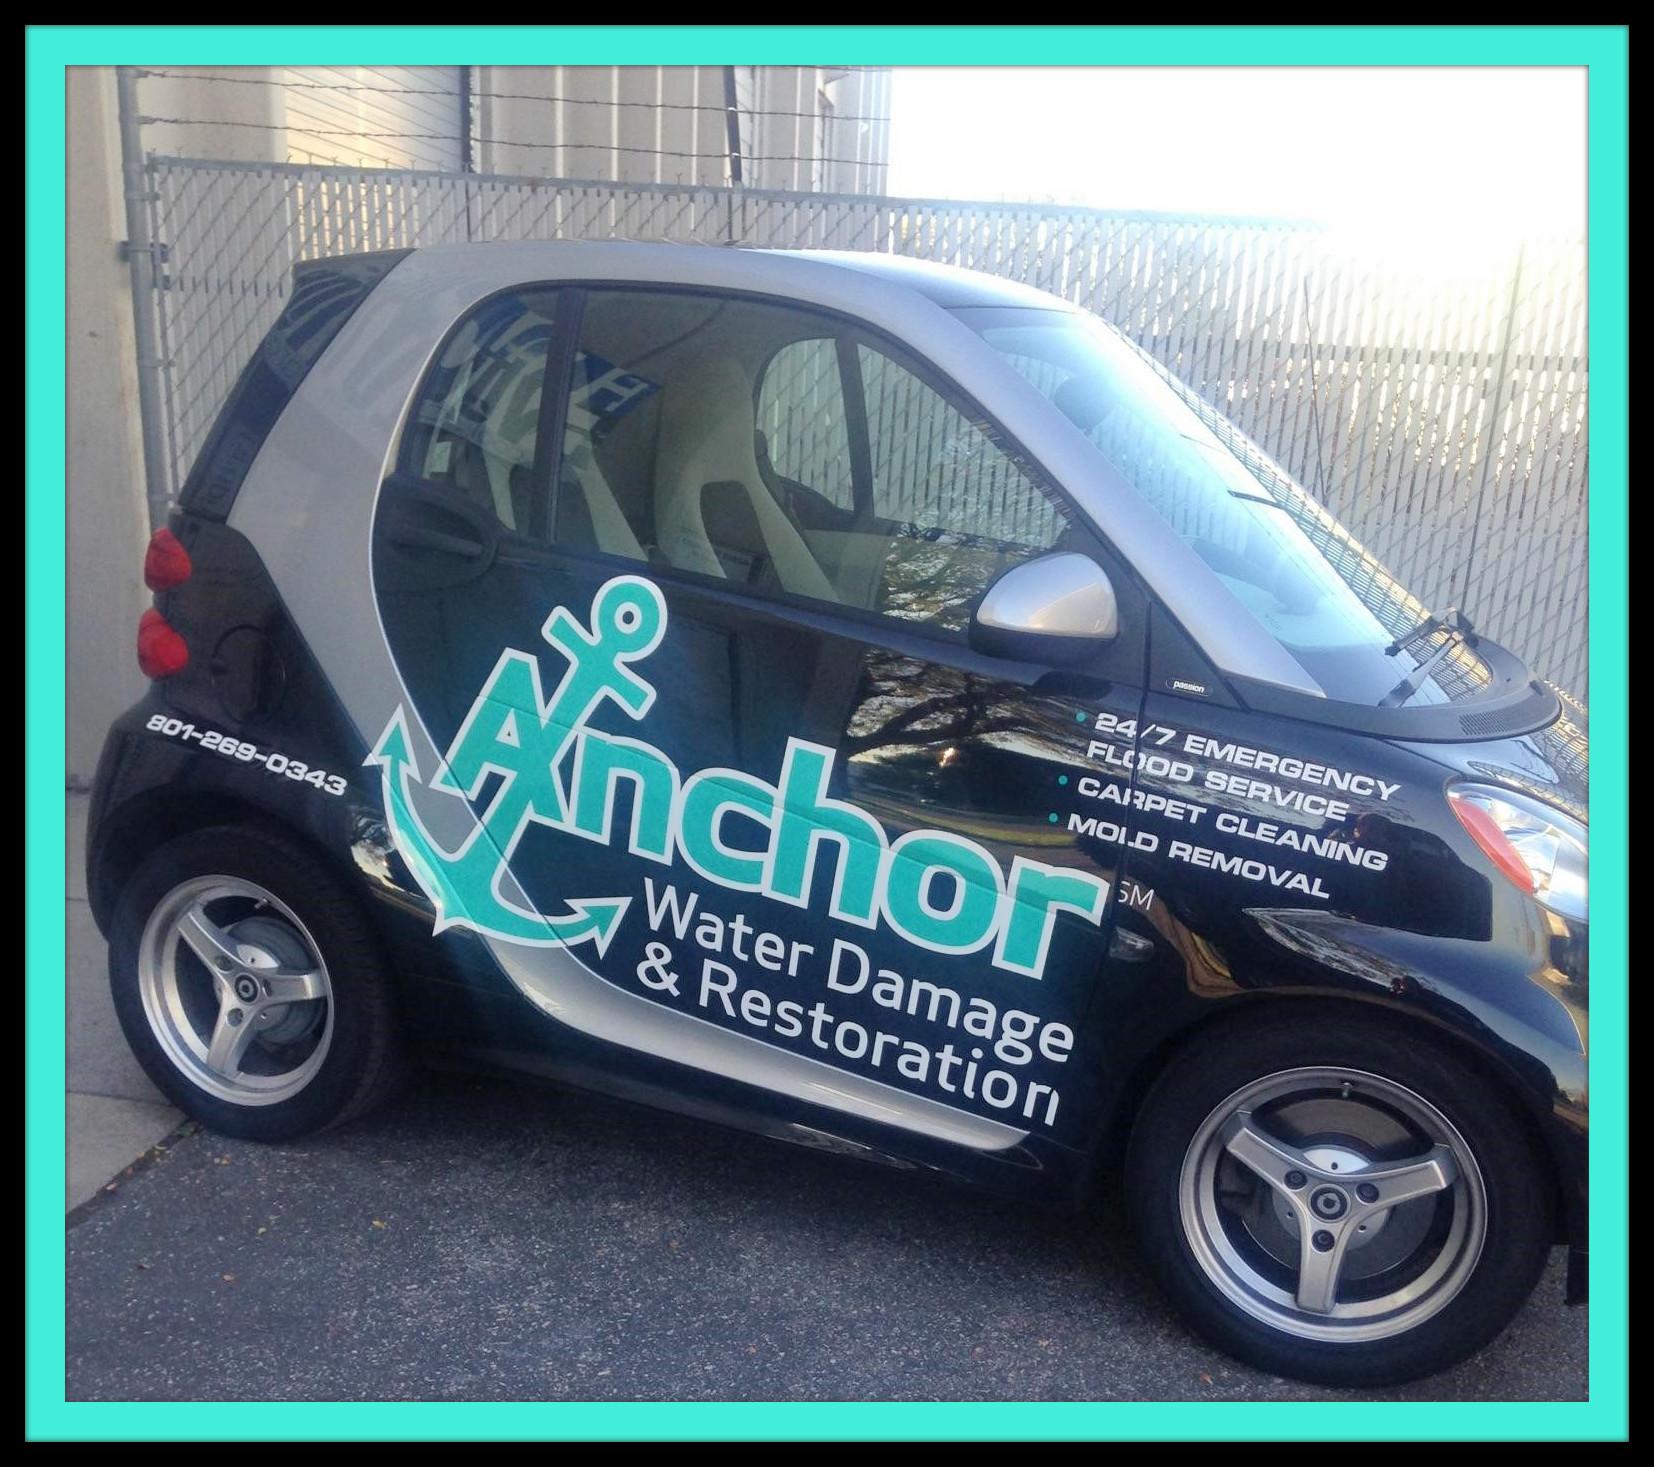 Anchor Water Damage & Restoration image 4